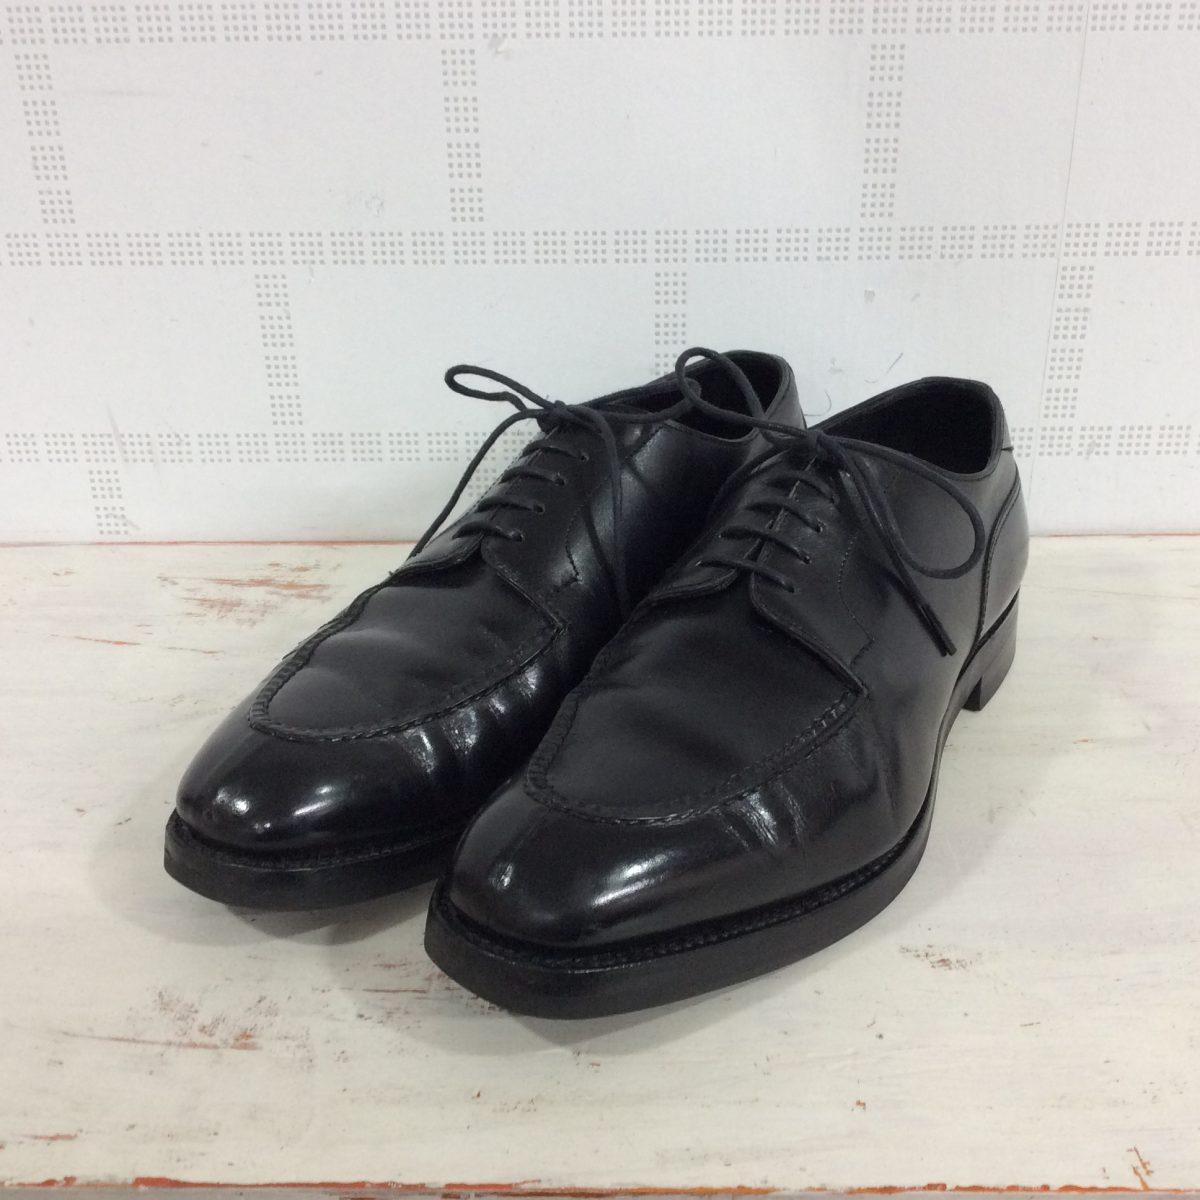 weward green エドワードグリーン DOVER レザーシューズ 革靴